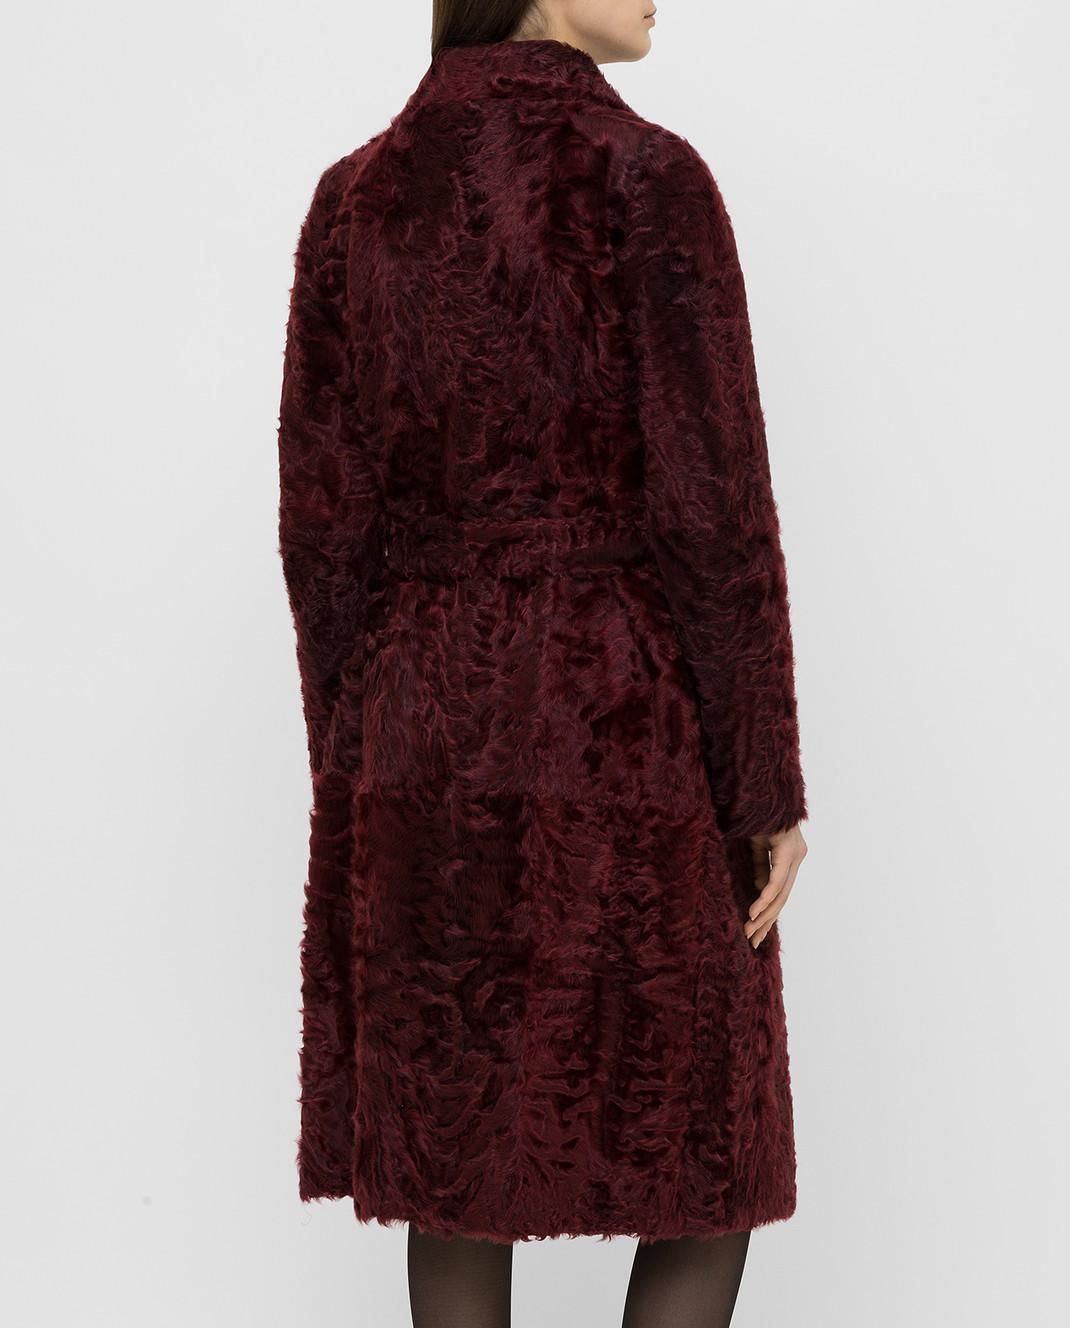 Giuliana Teso Бордовая шуба из меха ягненка 64K6210 изображение 4